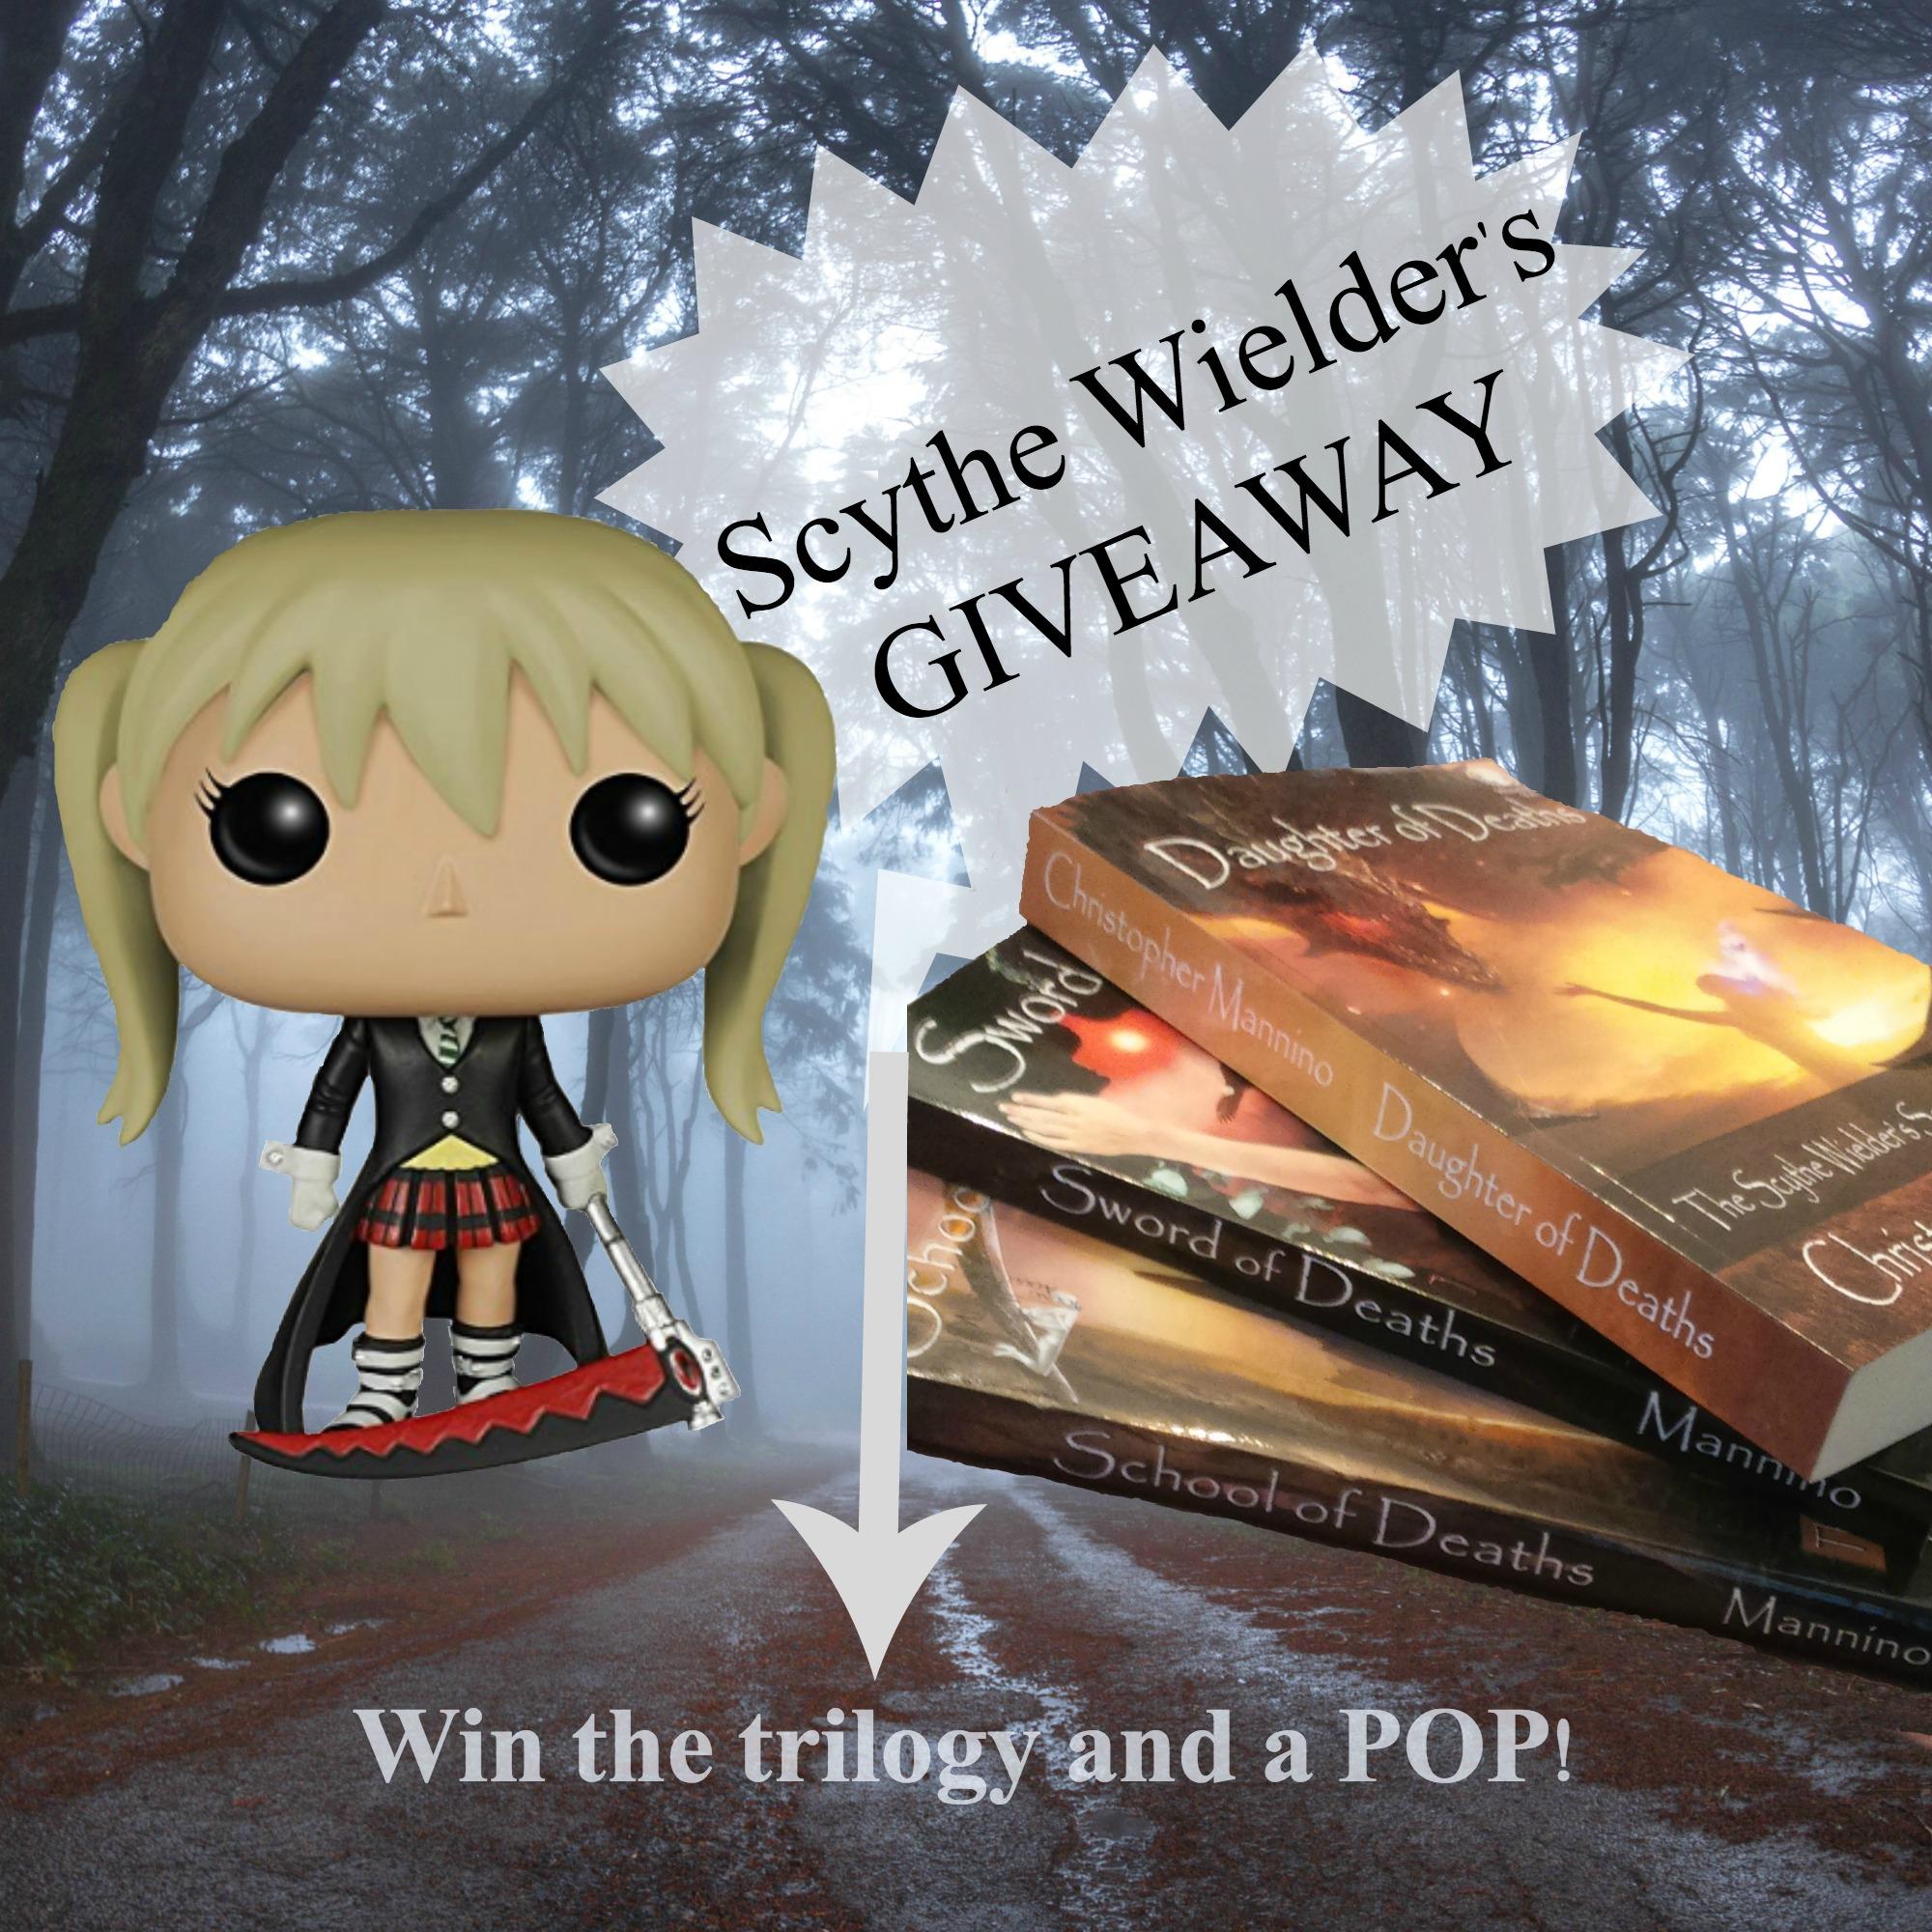 THE SCYTHE WIELDER'S SECRET Trilogy in paperback and a POP Figure!